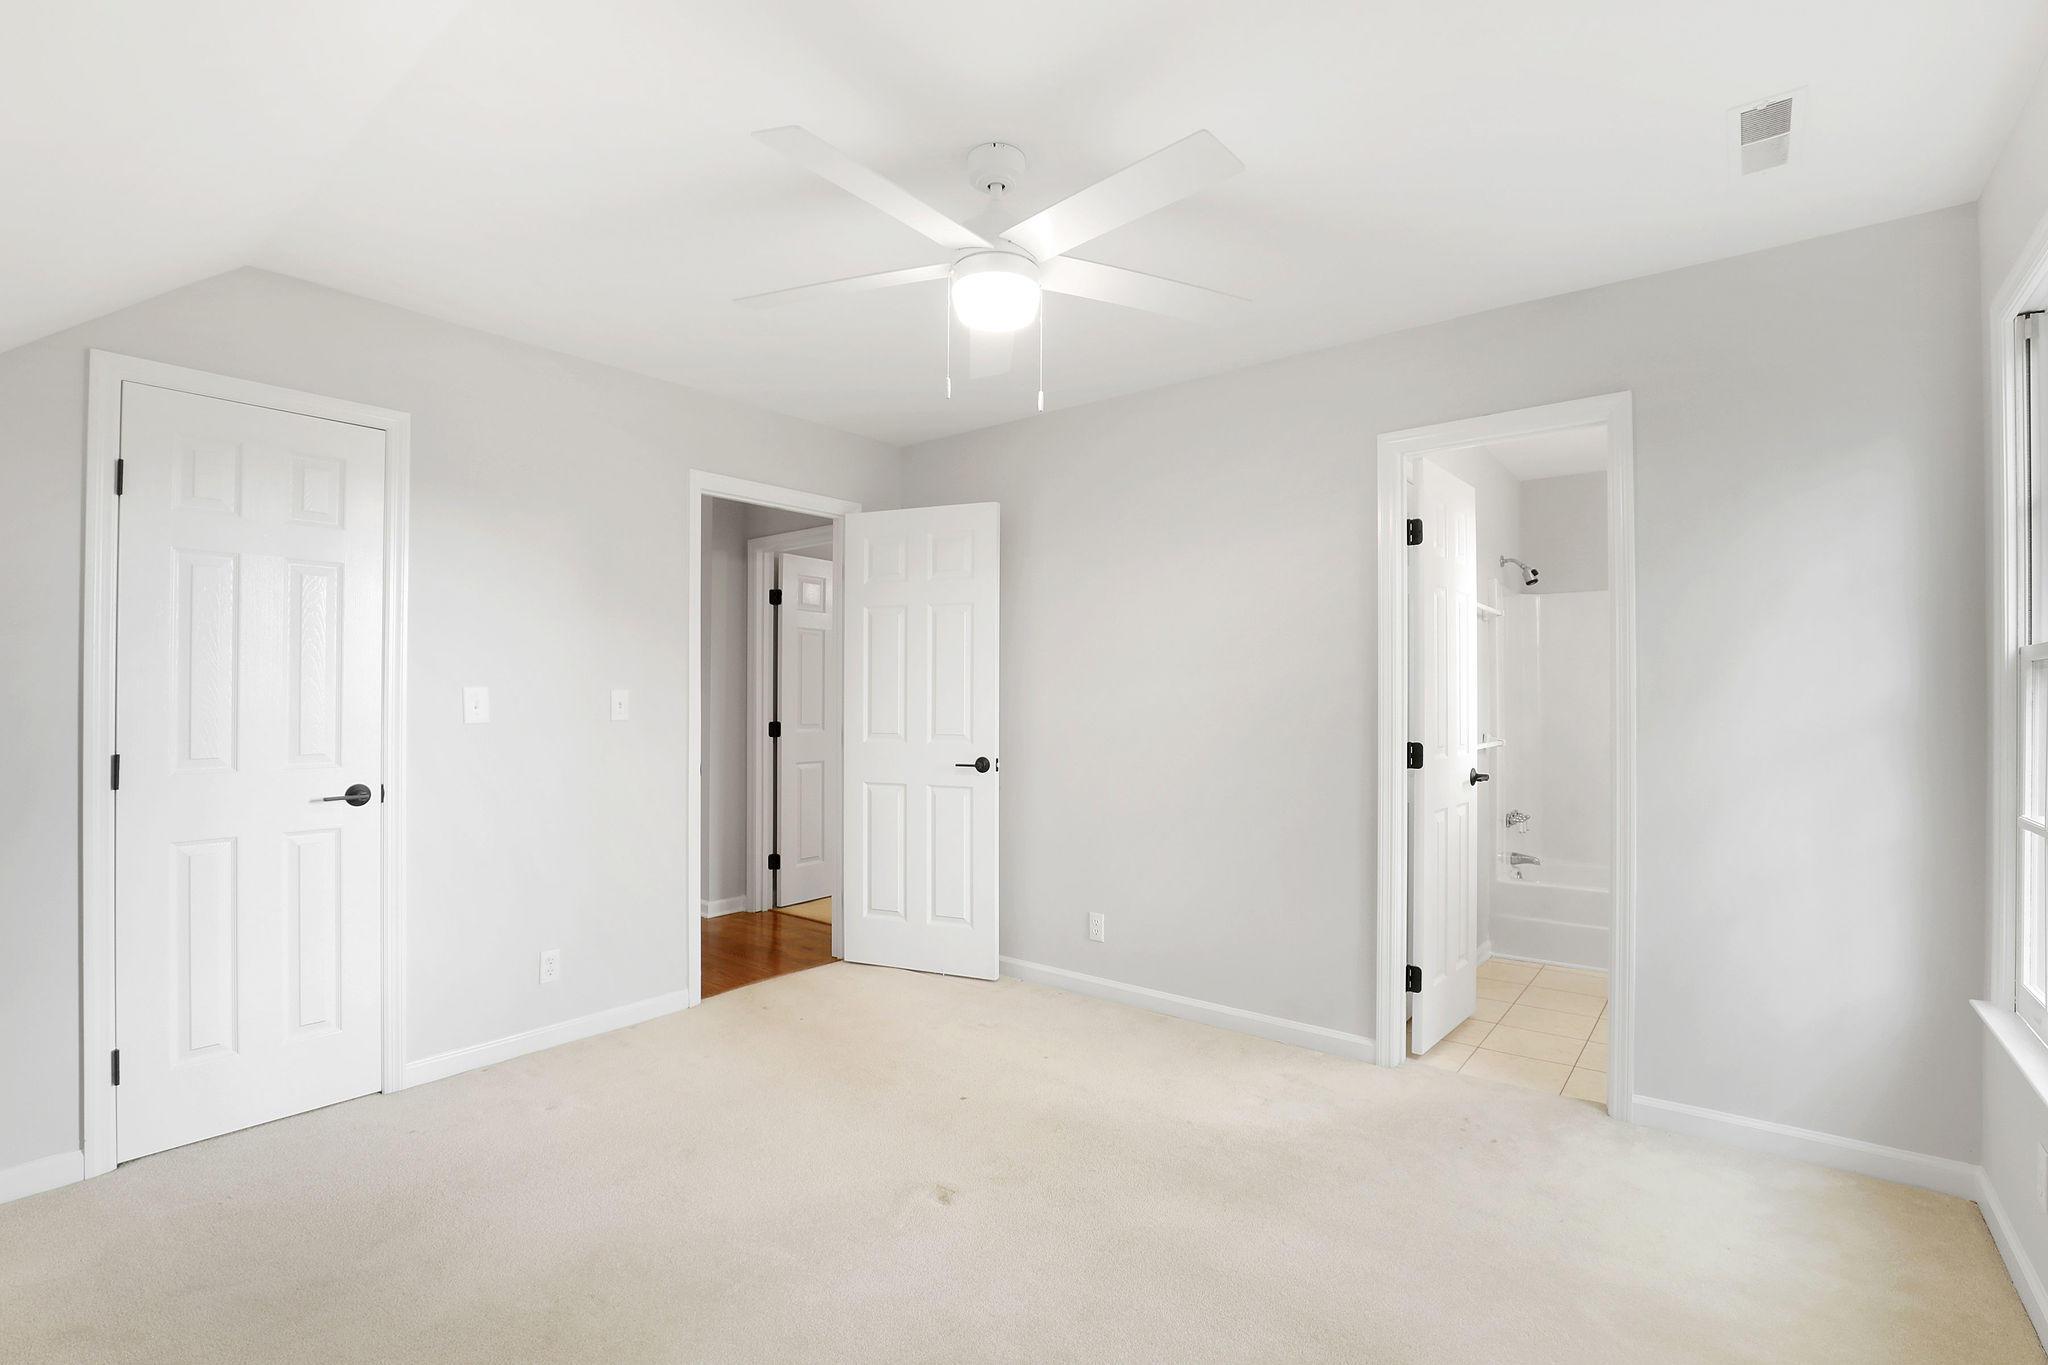 Old Mt Pleasant Homes For Sale - 1417 Edwards, Mount Pleasant, SC - 5